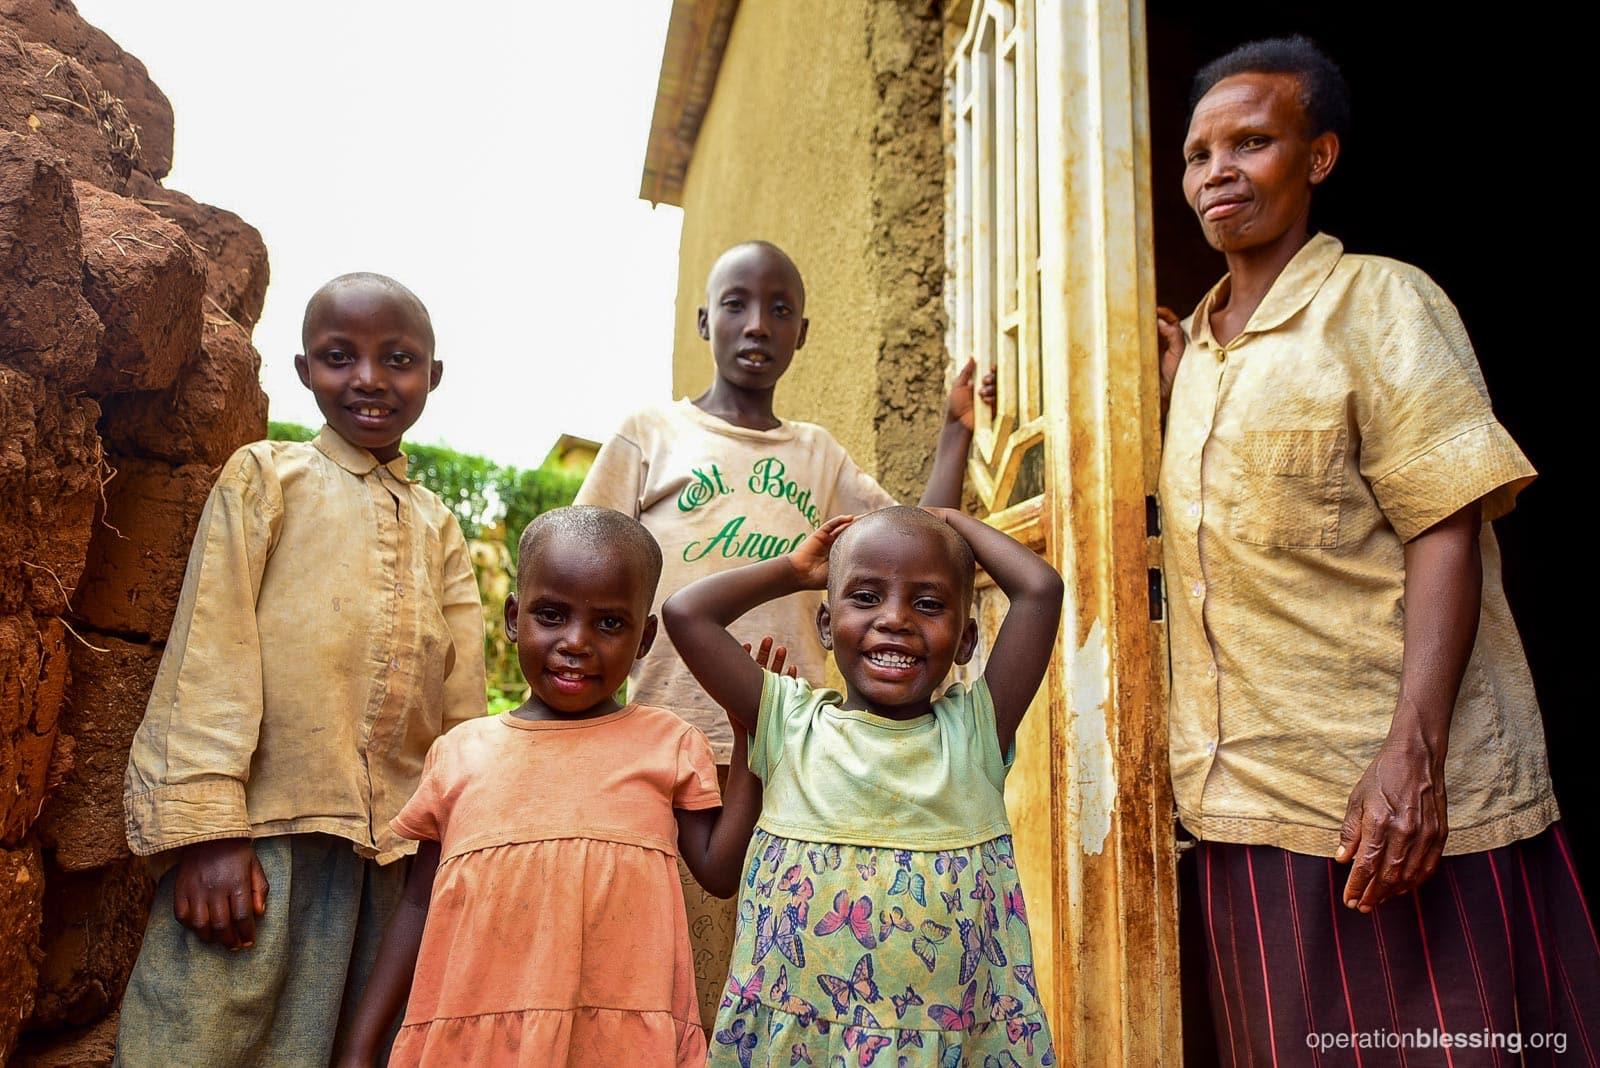 This family in Rwanda no longer has an uncertain future.